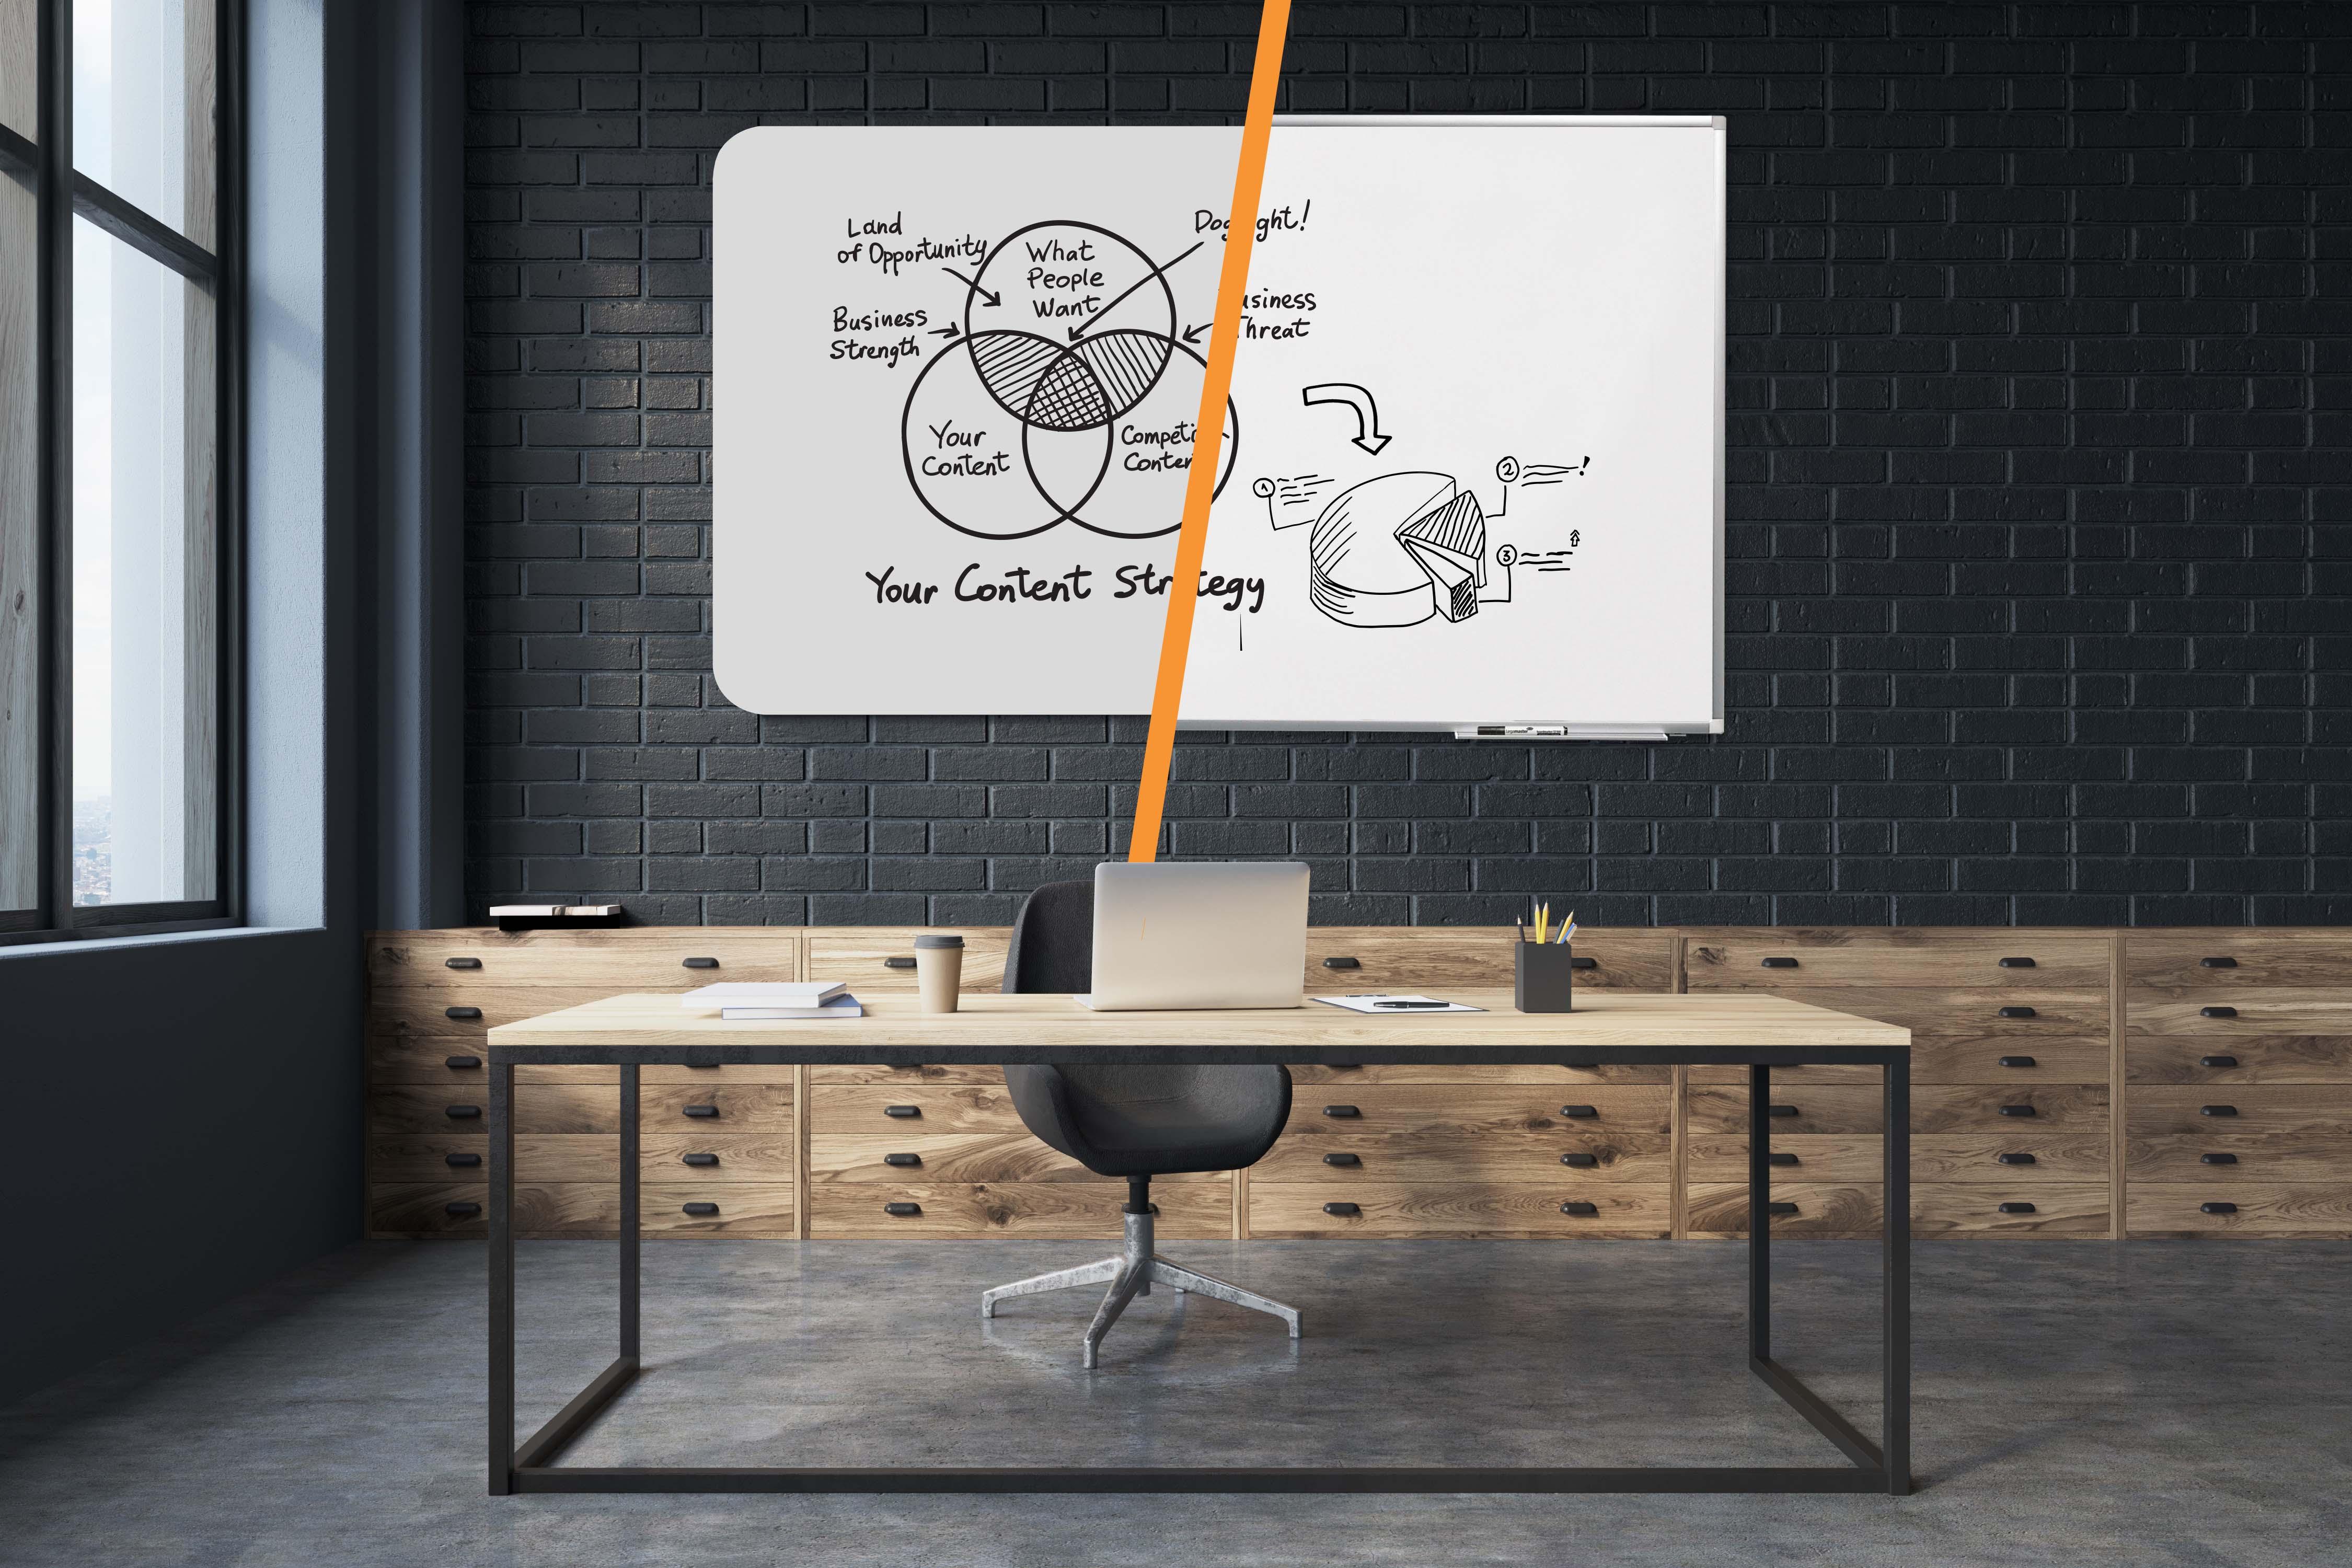 Fotomontage zeigt rahmenloses Whiteboard neben Whiteboard mit Rahmen